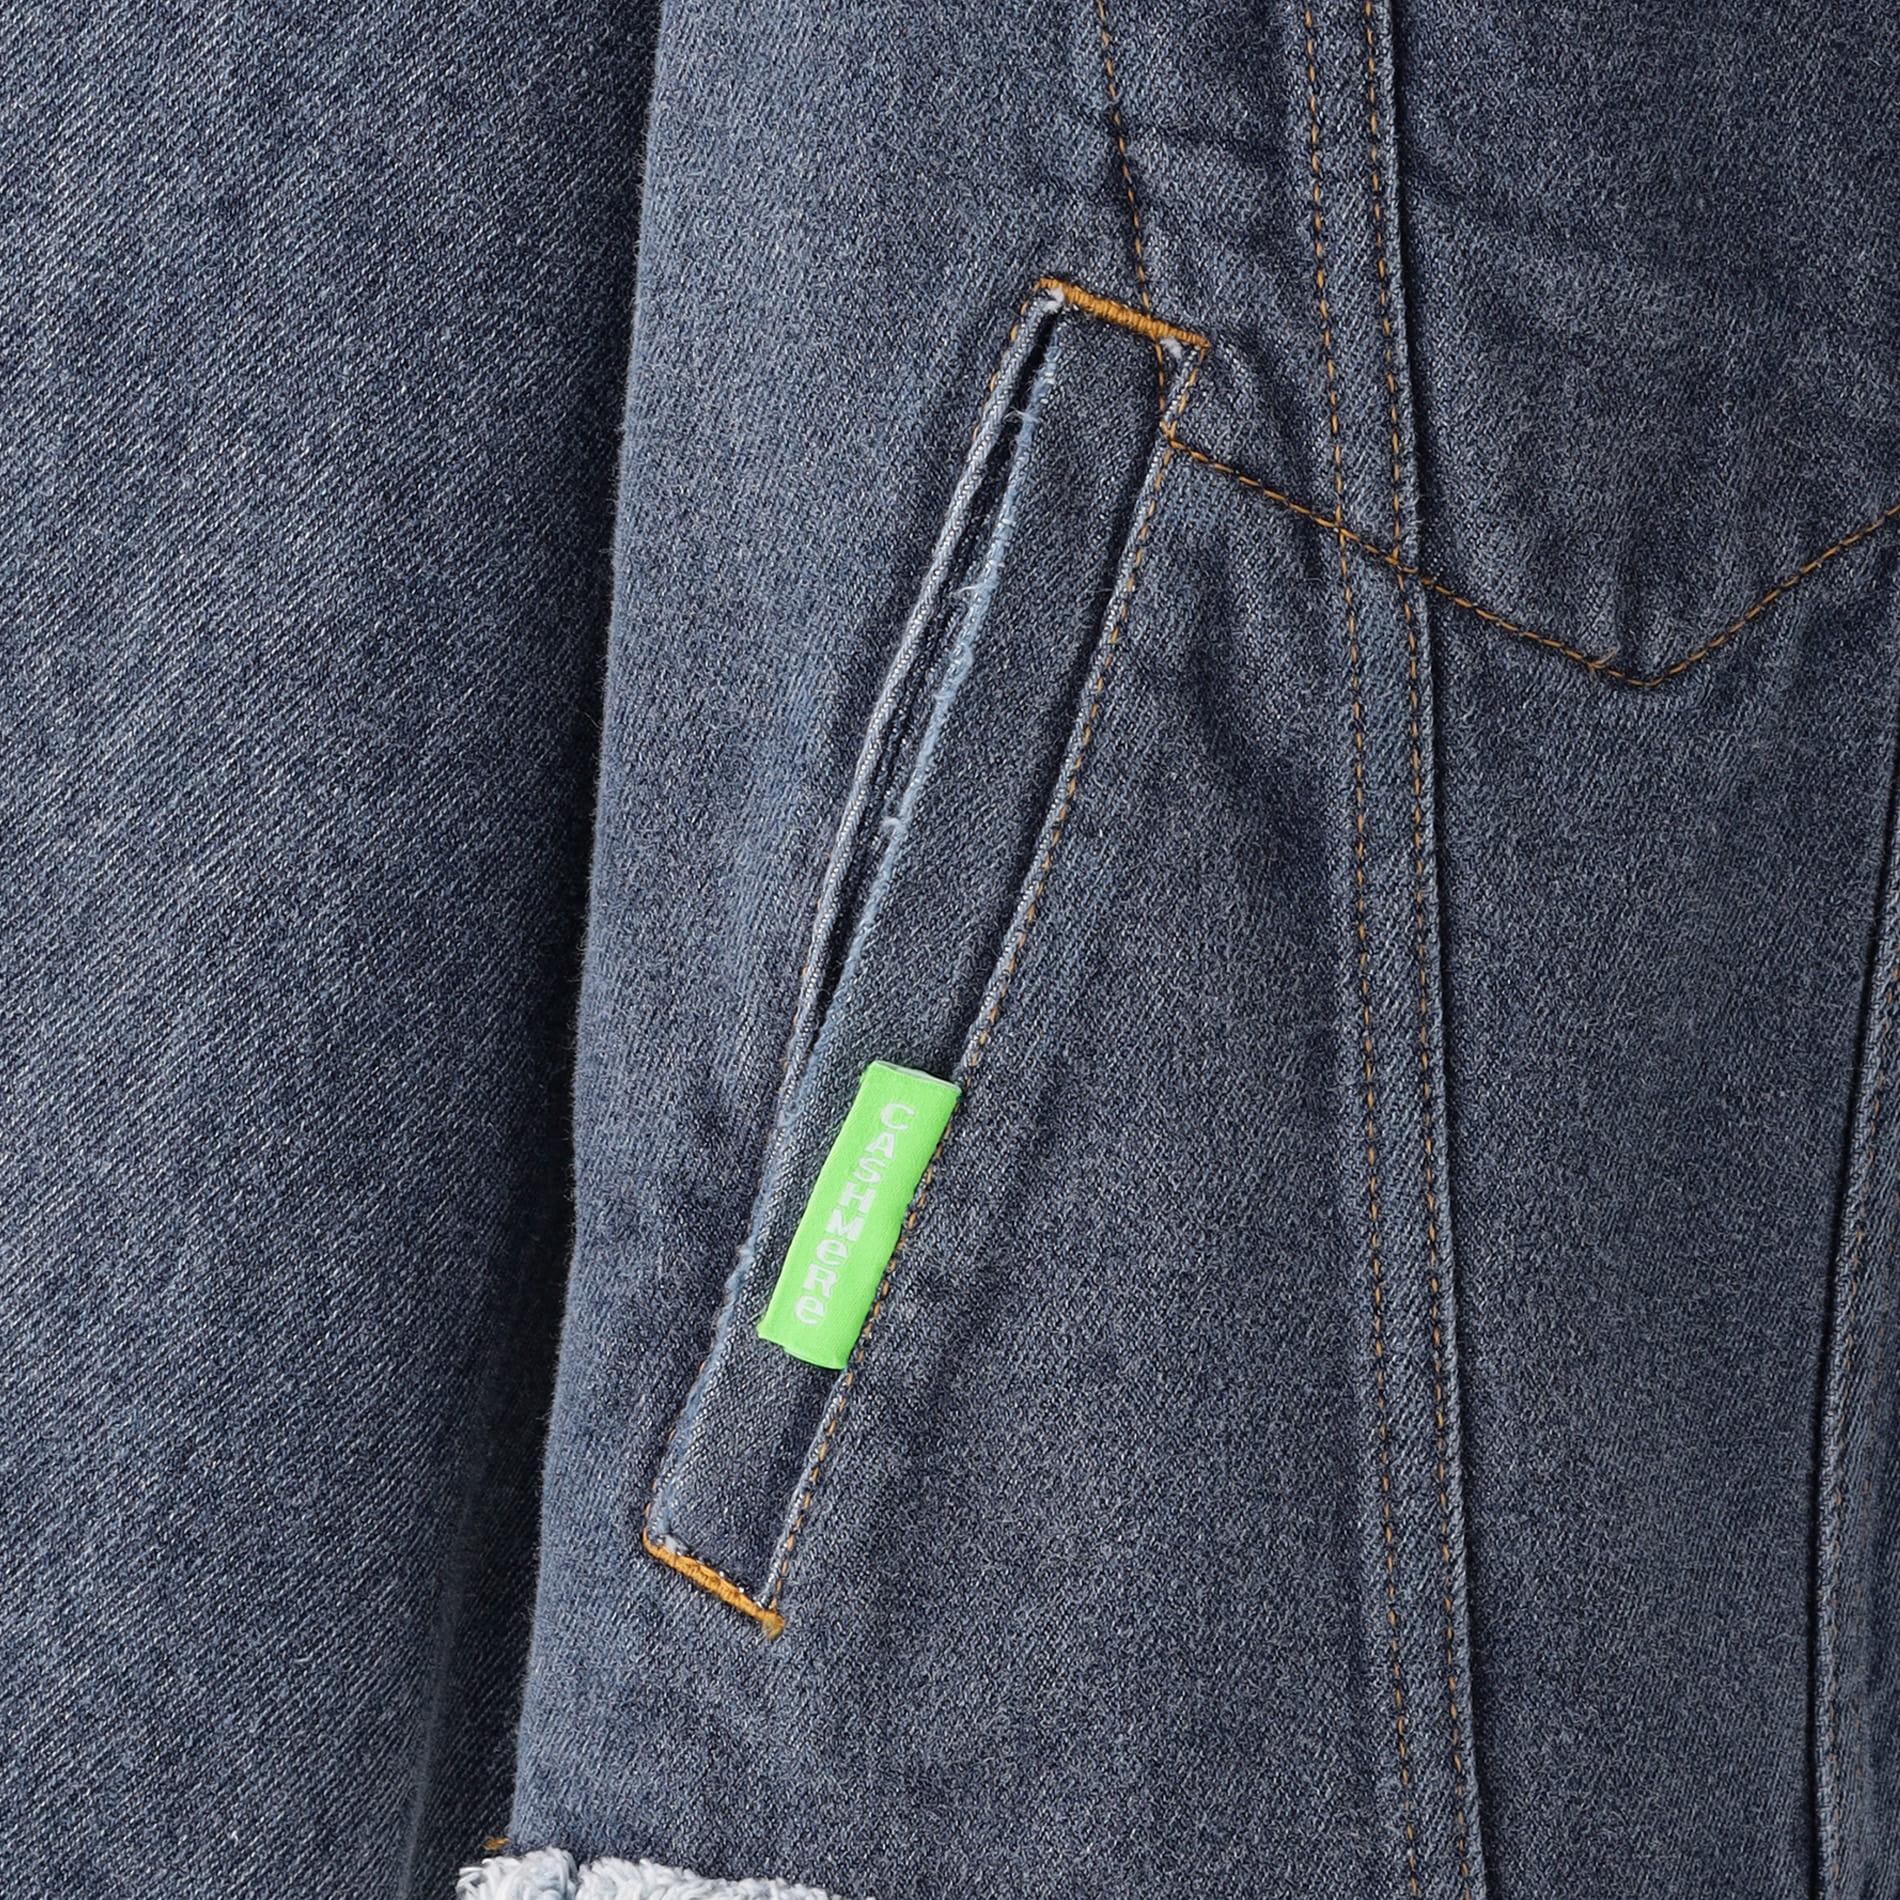 【doublet】MEN ジャケット UPCYCLE ORIGINAL DENIM PATCHWORK JACKET 21AW12BL126